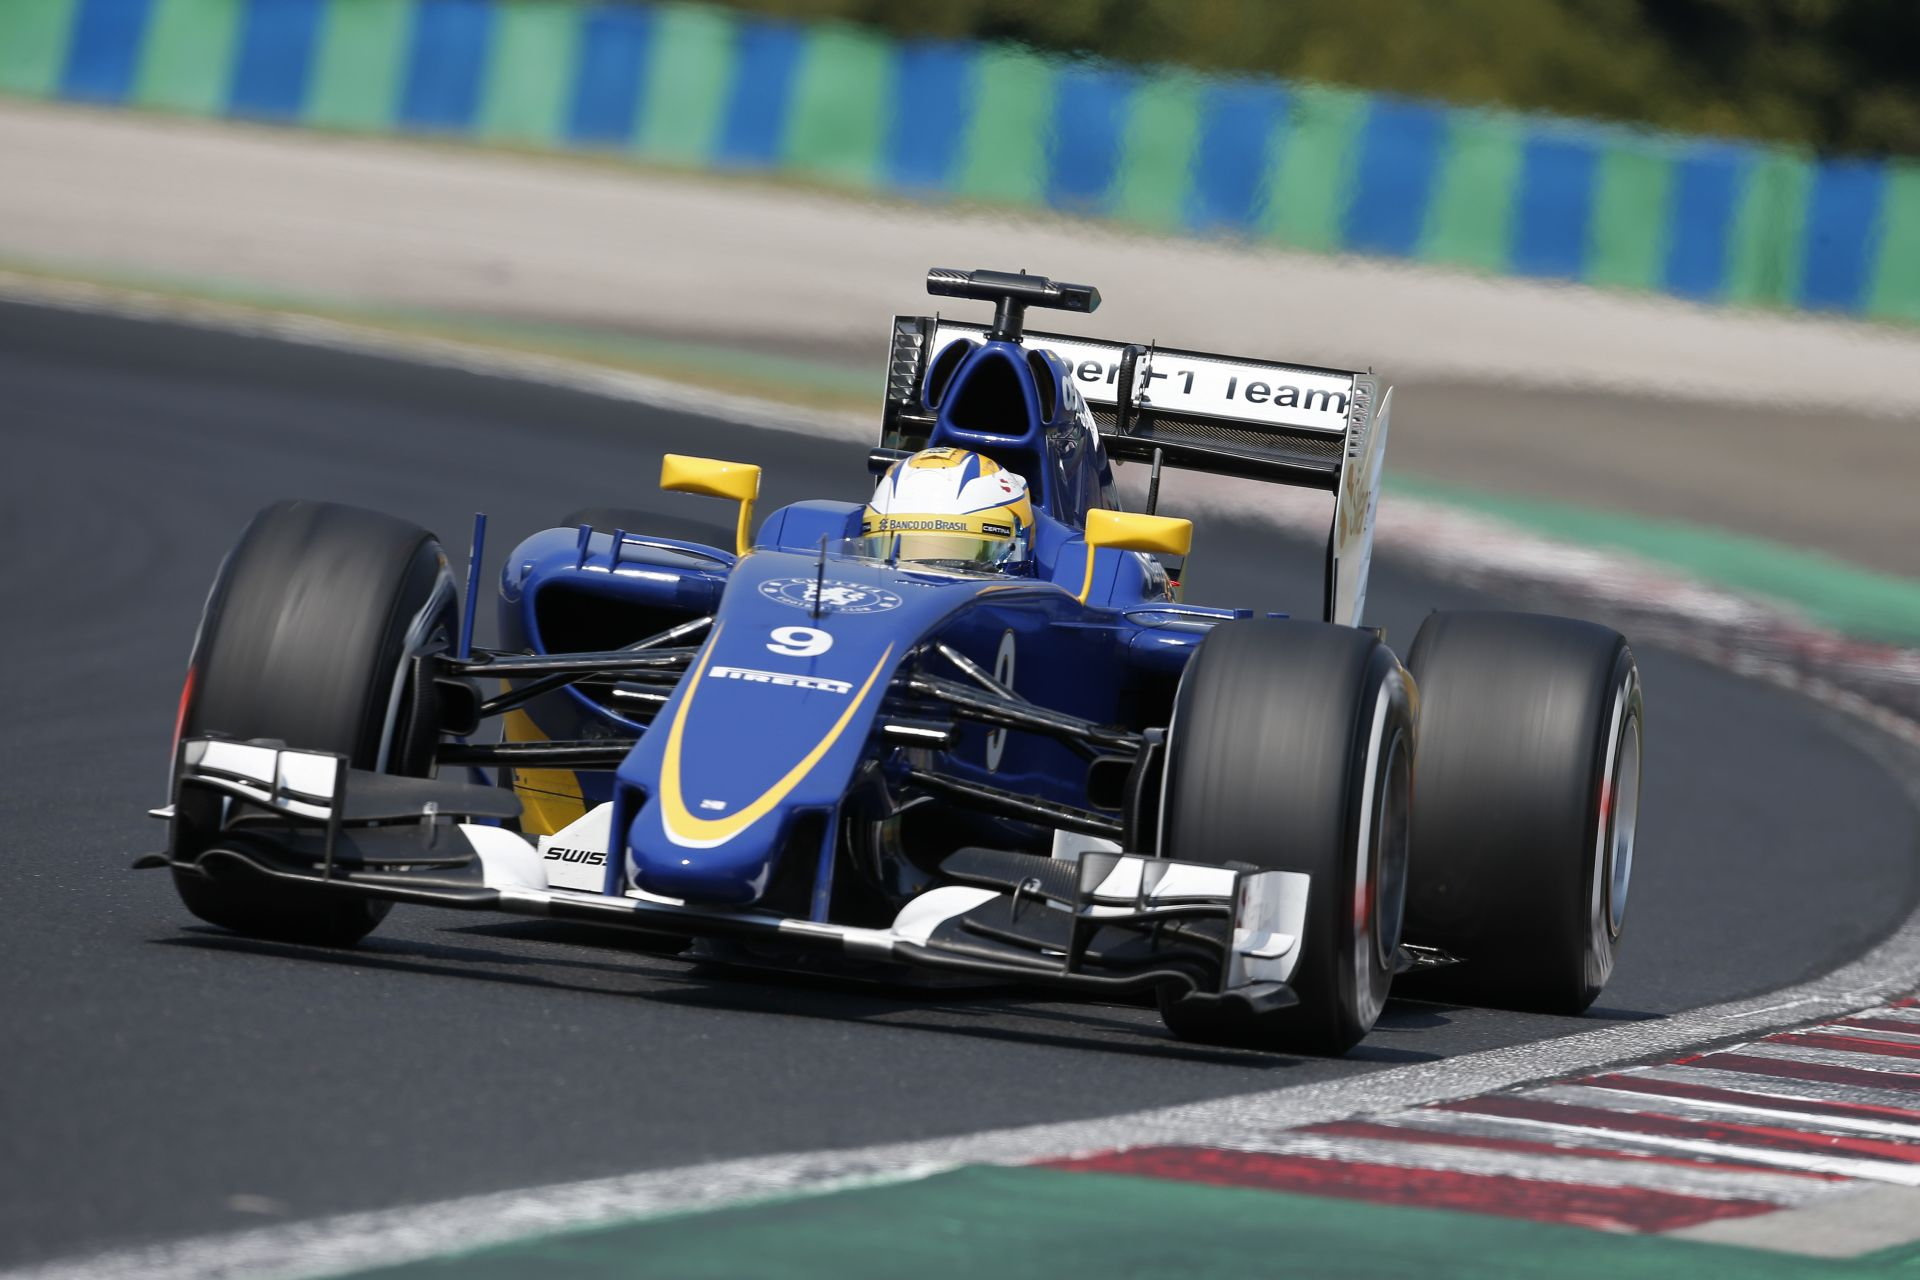 Megalakul a Renault-Sauber a Forma-1-ben?